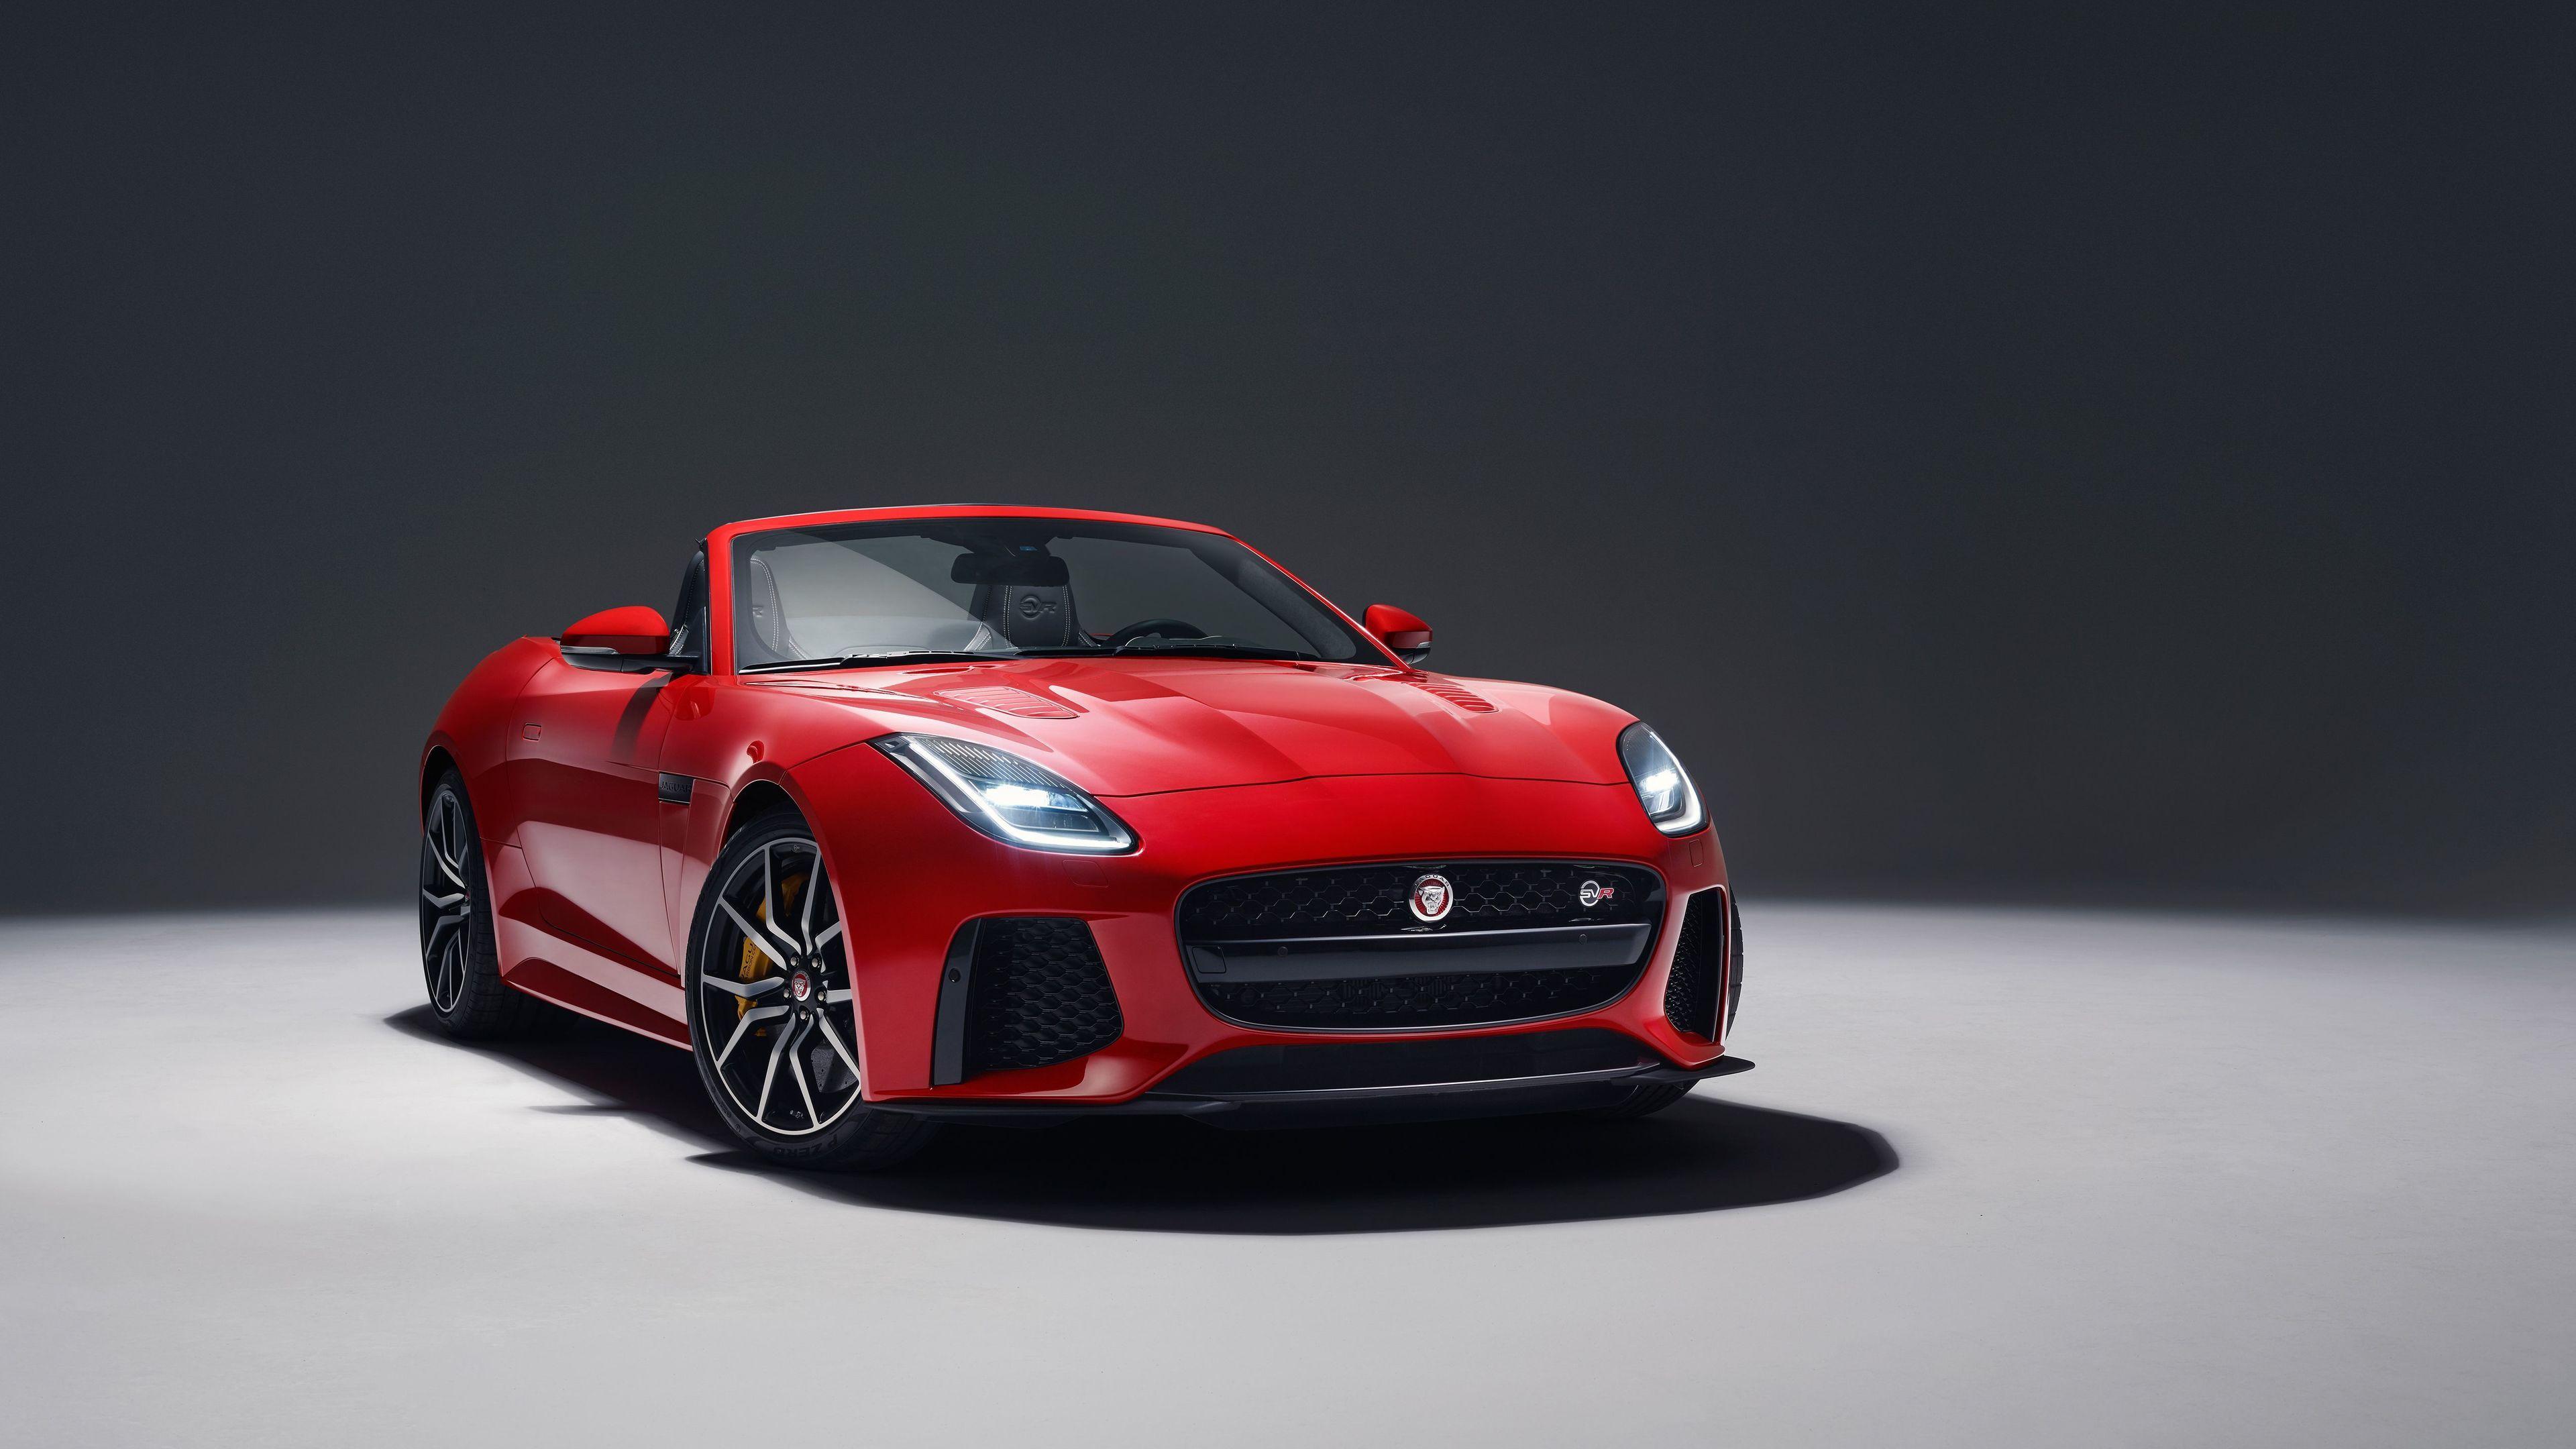 2018 Jaguar F Type Svr Front jaguar wallpapers, jaguar f type svr wallpapers, hd…